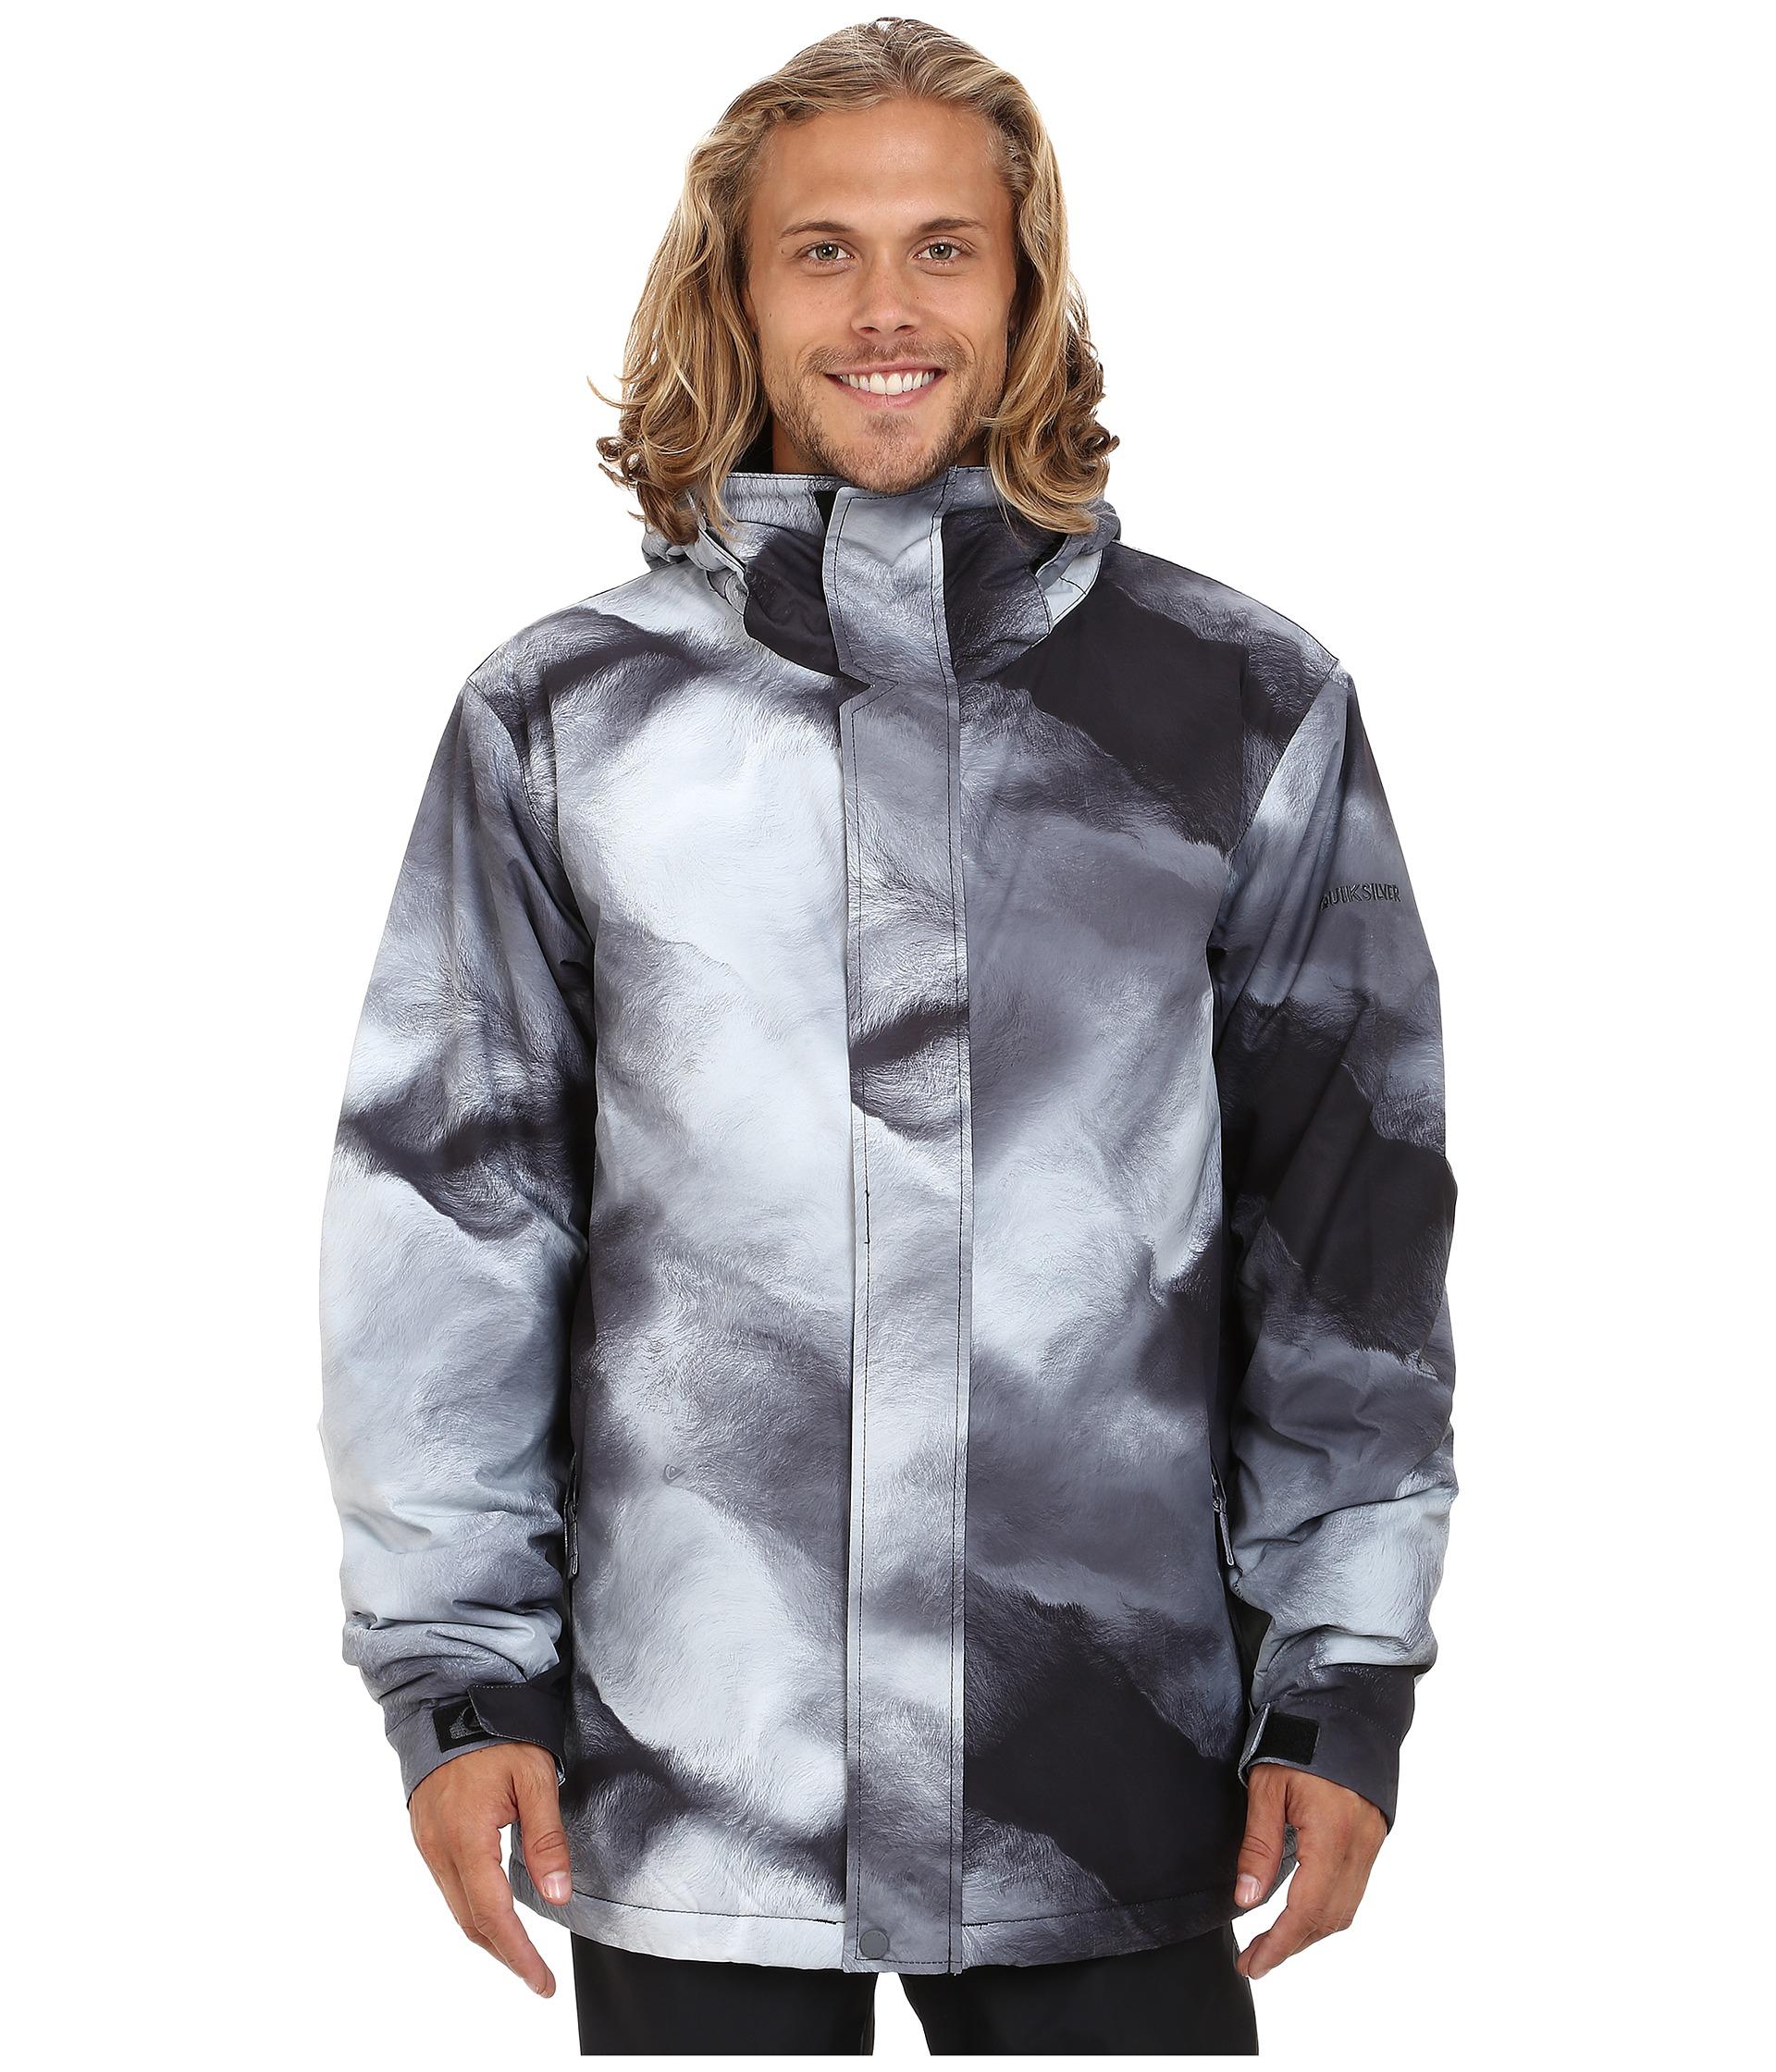 Quiksilver mens jacket - Gallery